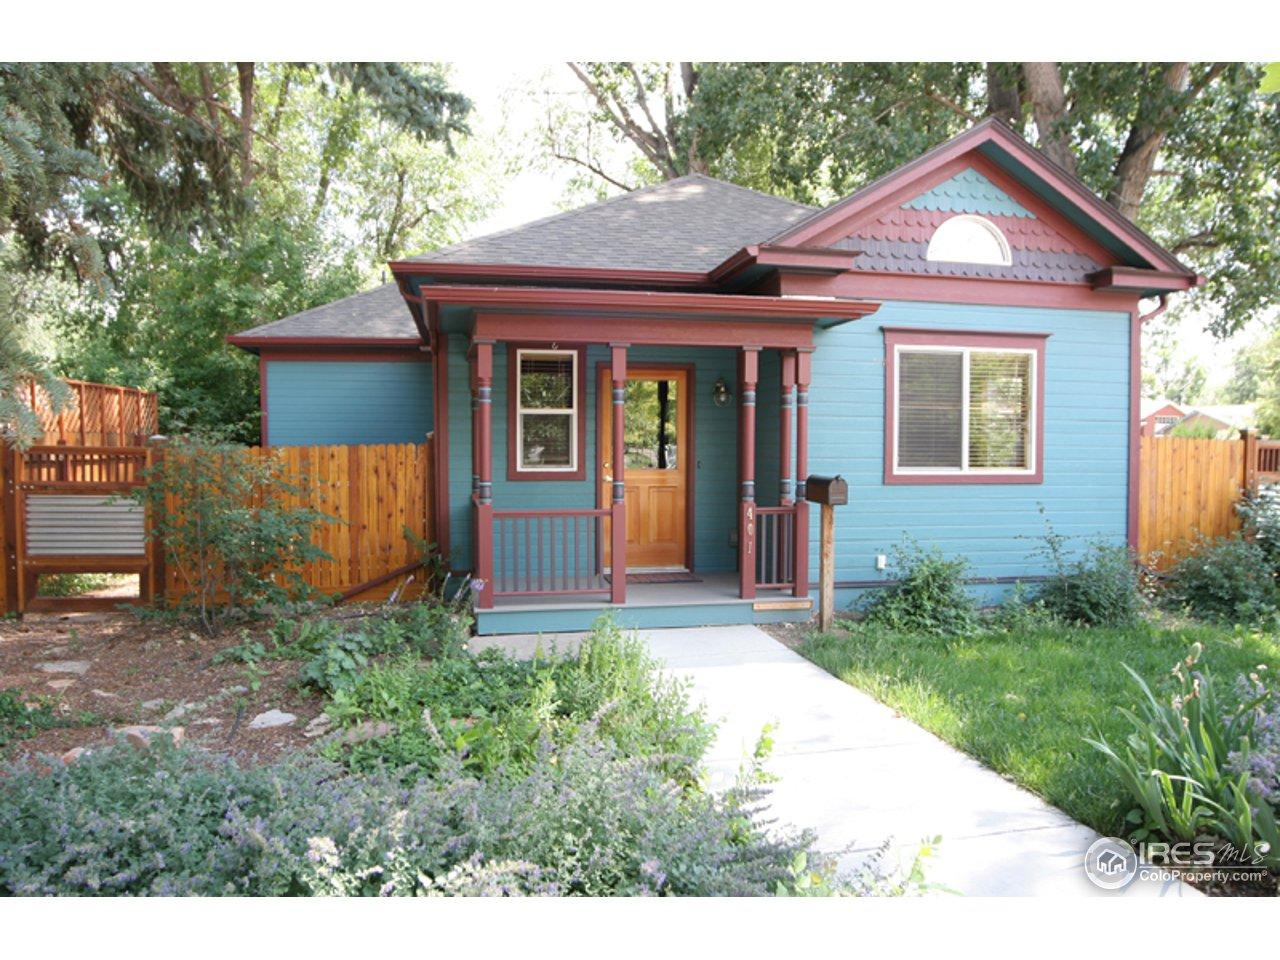 401 Edwards St, Fort Collins CO 80524